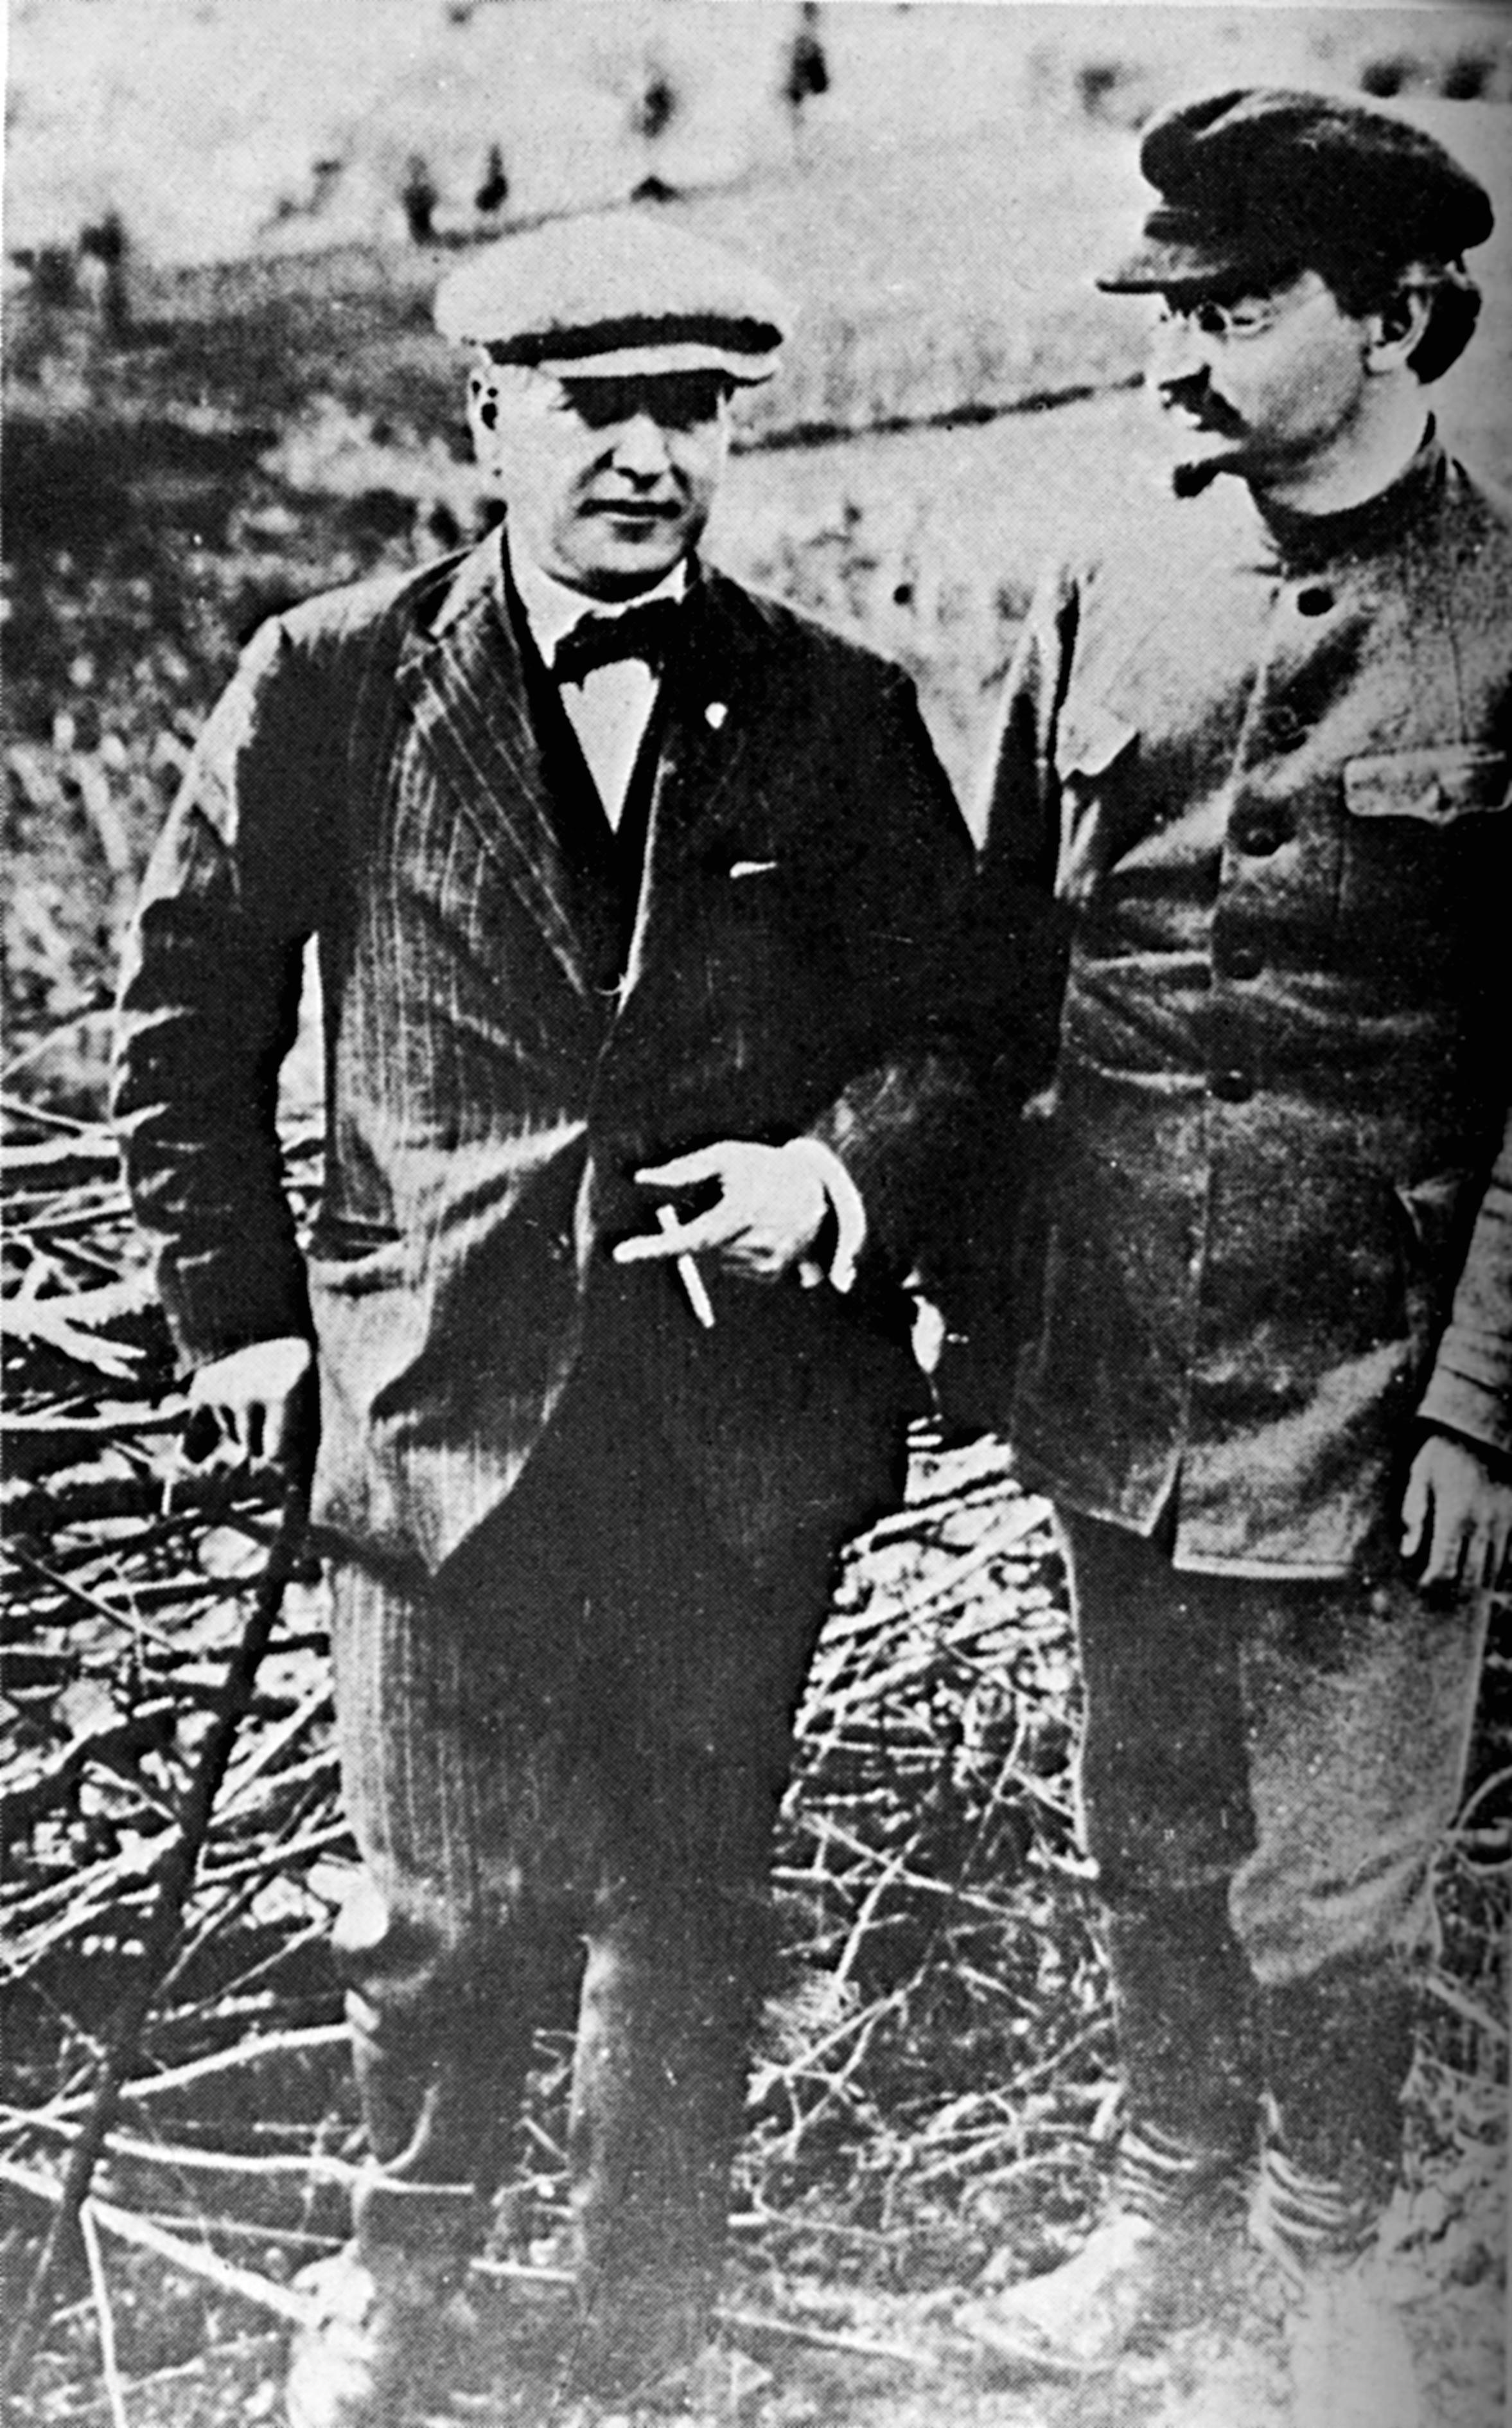 Leon Trotsky (1879 - 1940)